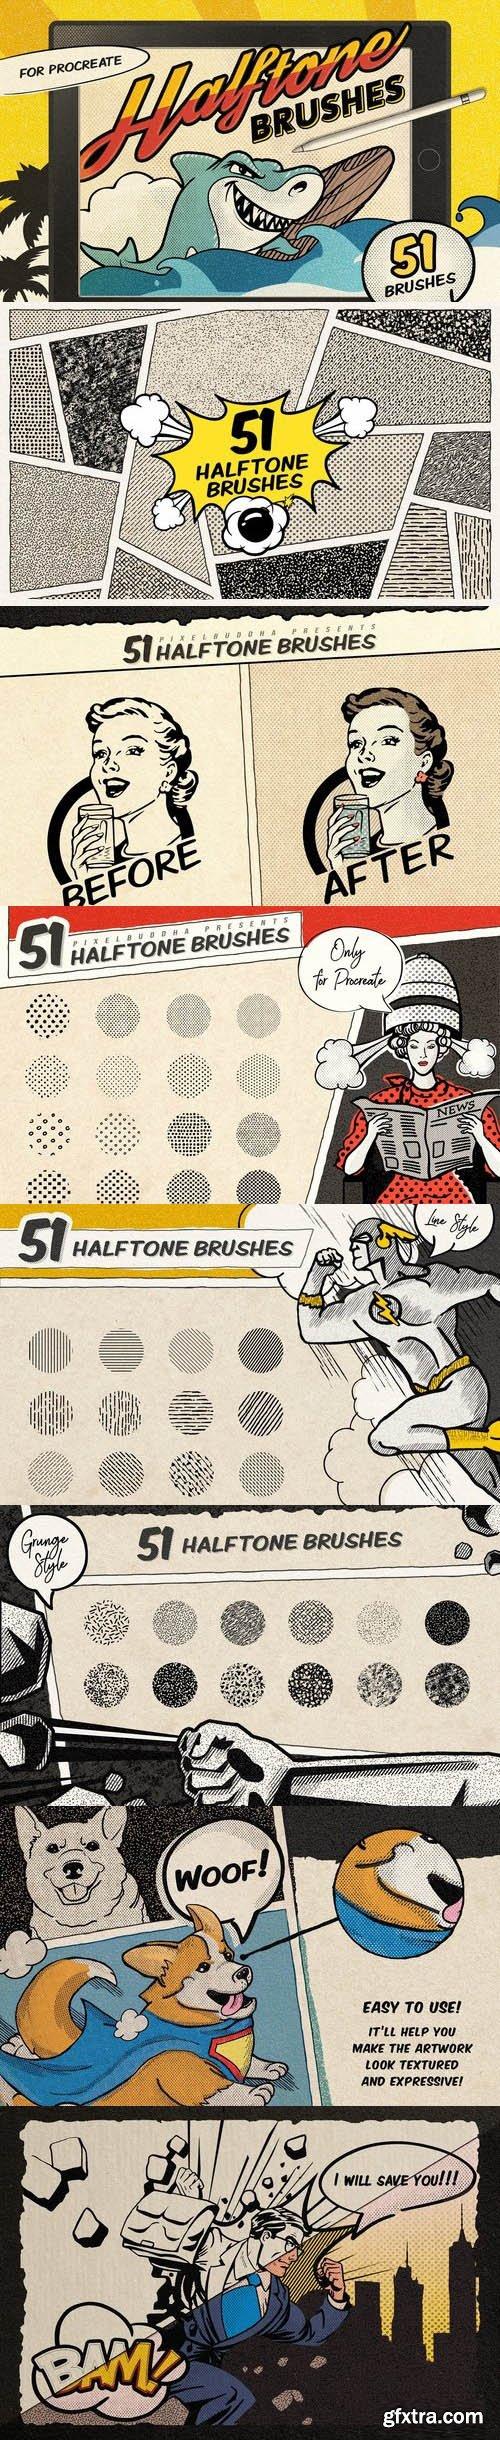 CM - Vintage Comic Procreate Brushes 3402568